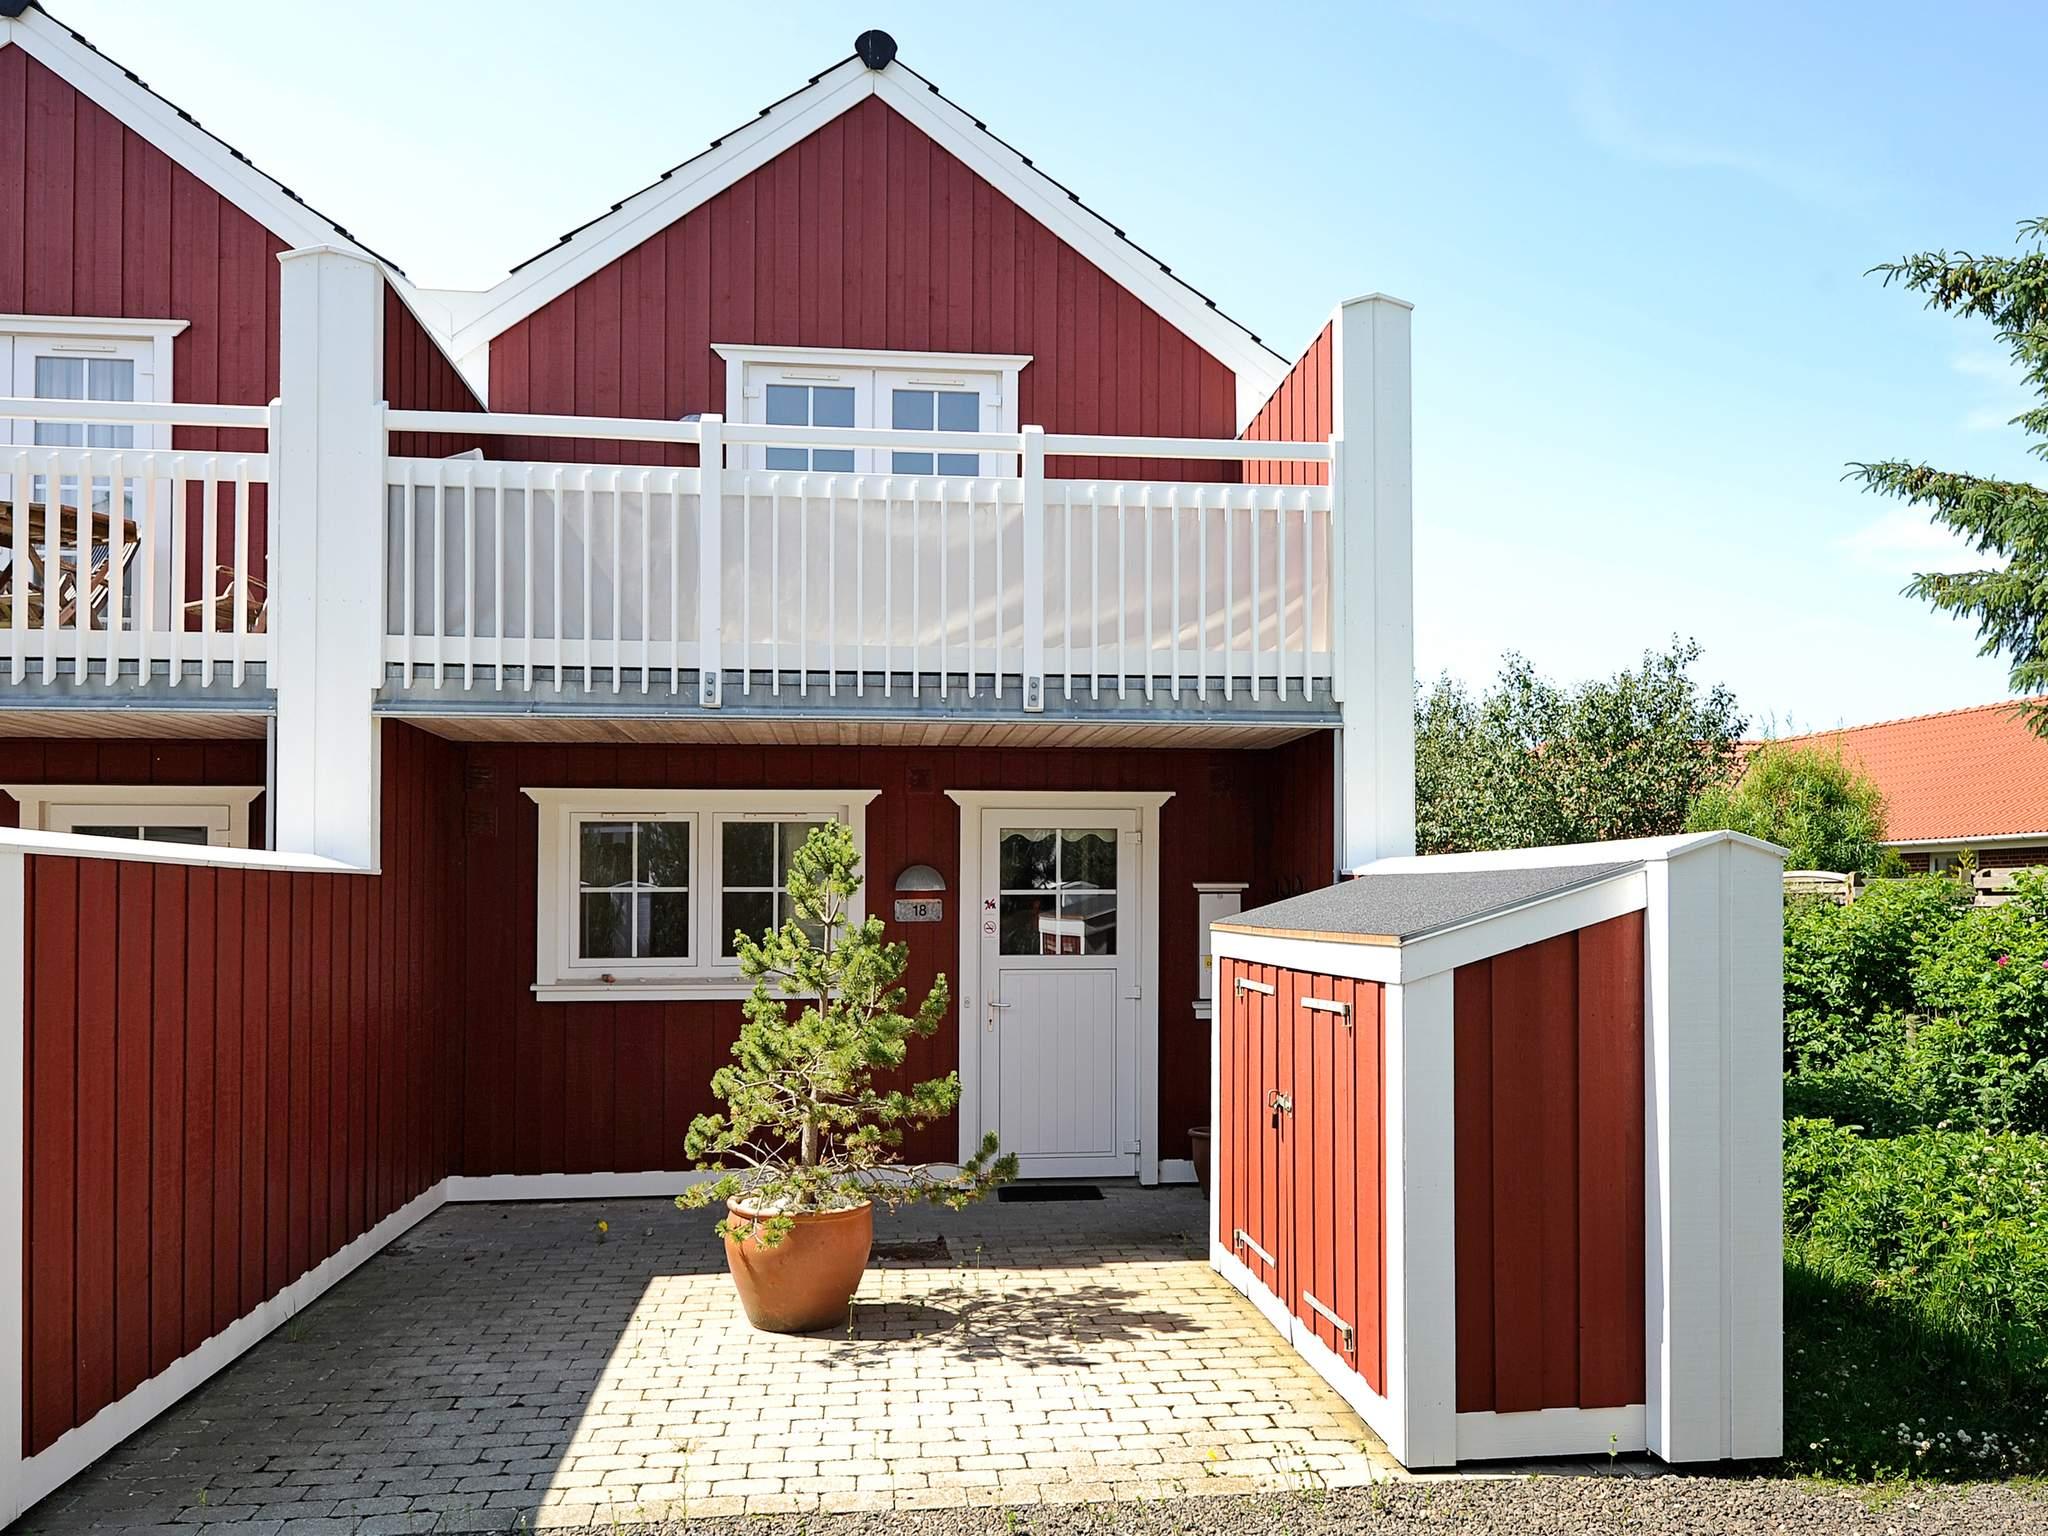 Ferienhaus Blåvand (226304), Blåvand, , Westjütland, Dänemark, Bild 1